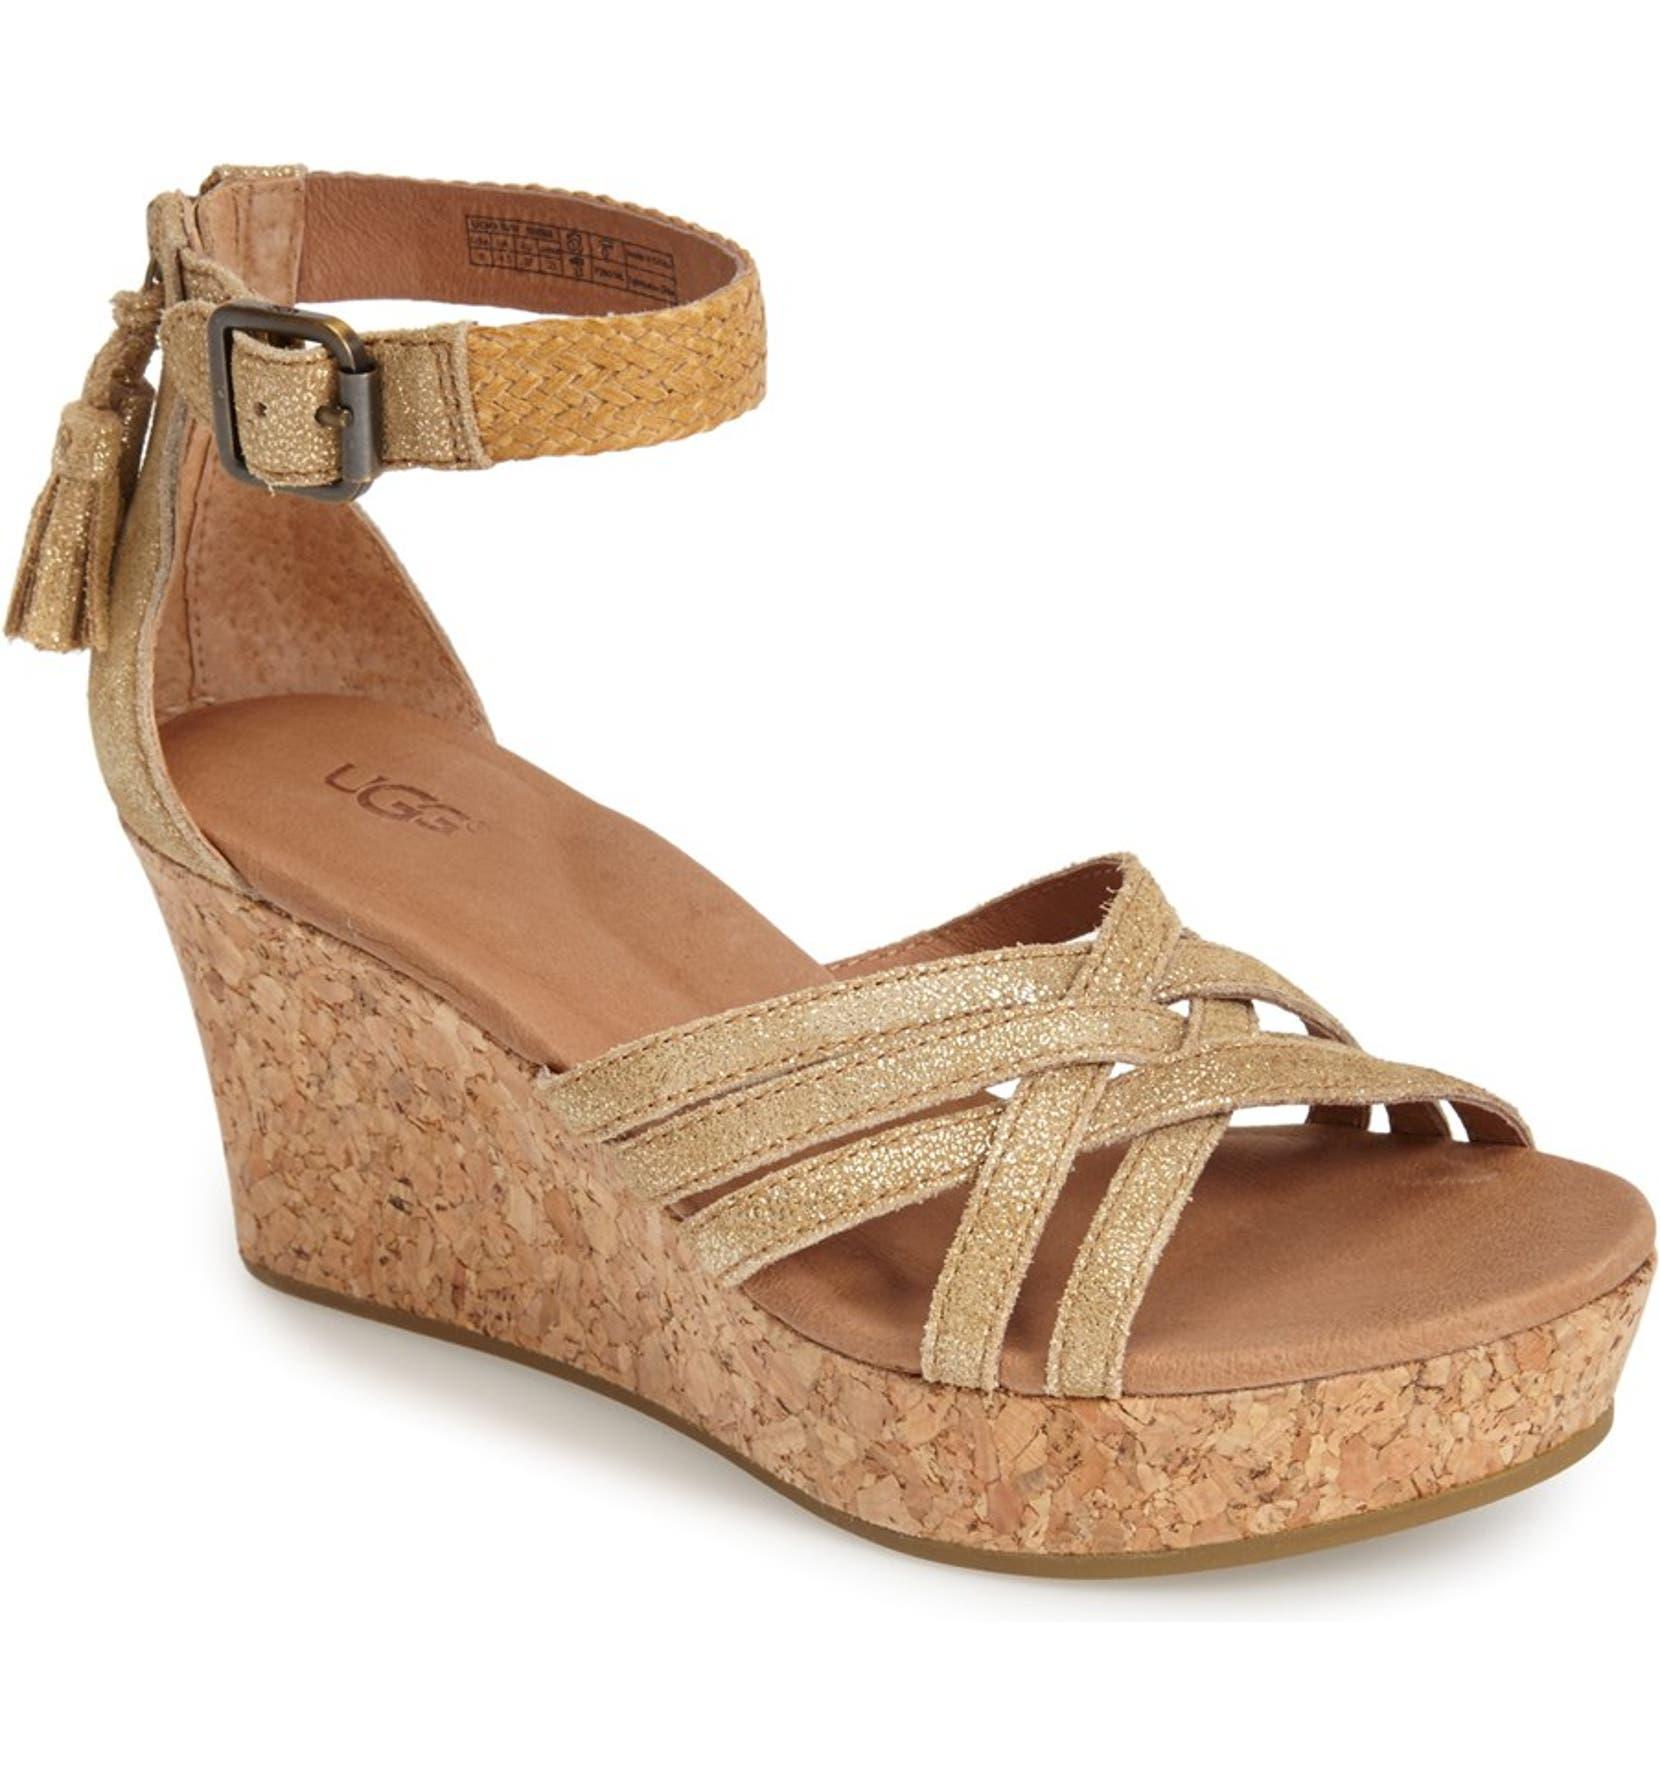 f2d966a70fb Australia 'Lillie' Glitter Suede Wedge Sandal